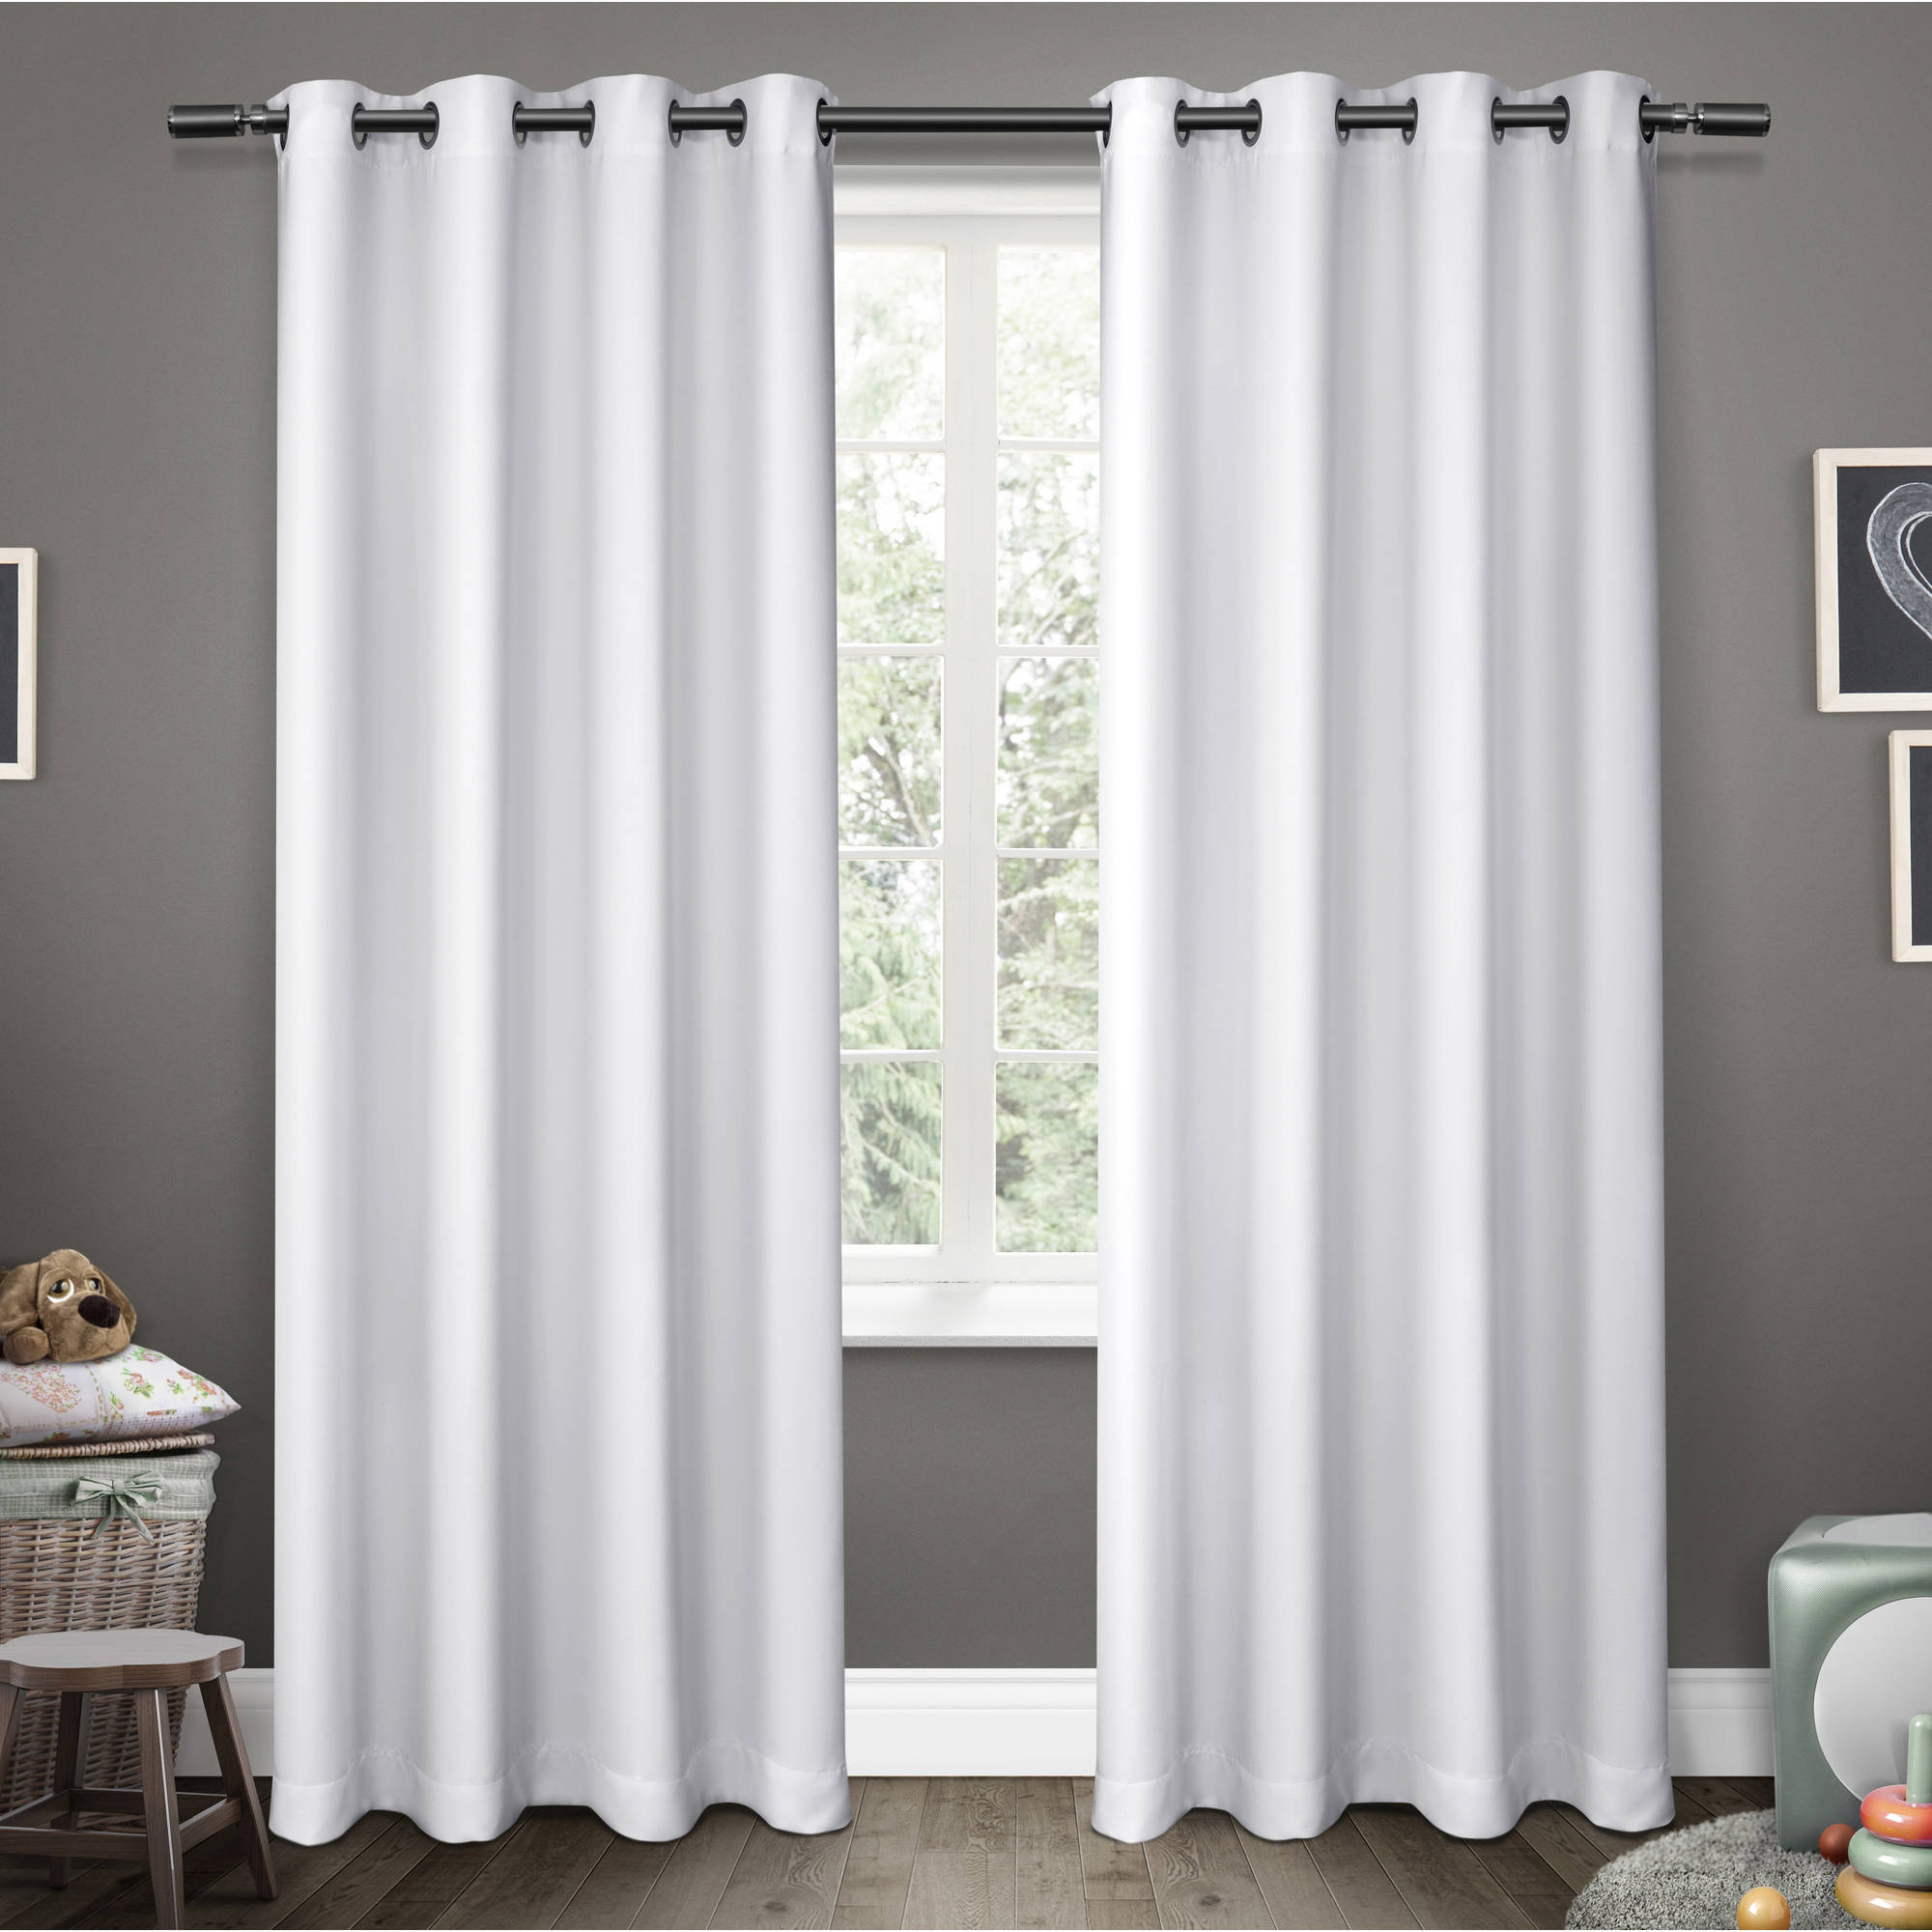 "Kids Sateen Room Darkening Grommet Top Window Curtain Panel Pair, White, 52"" X 96"""